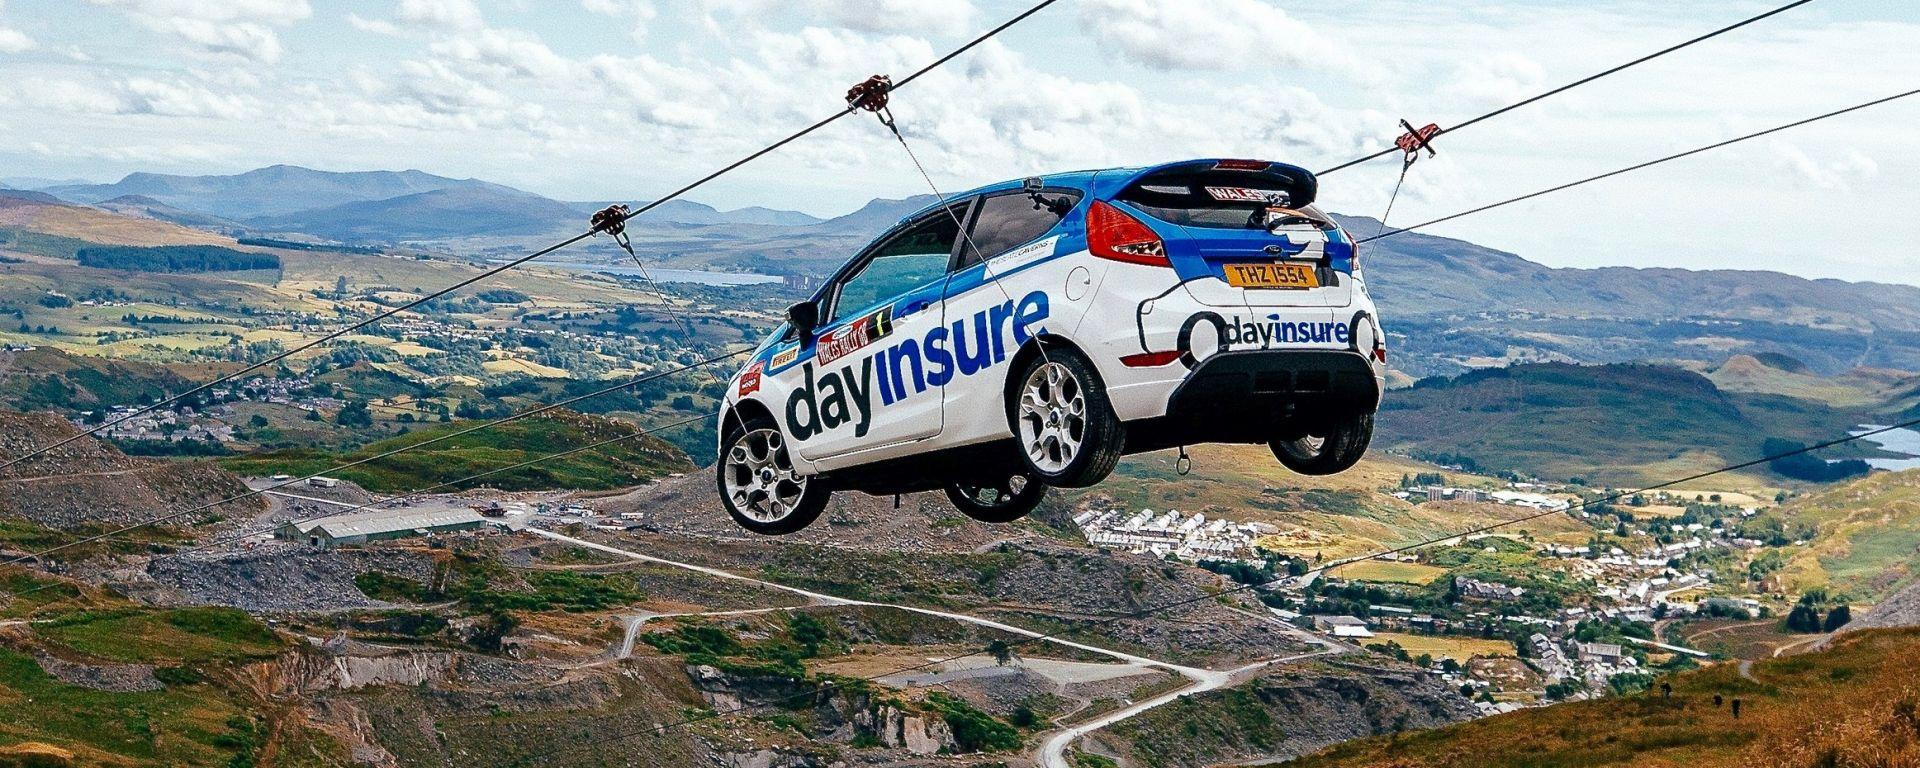 WRC Rally Wales GB: Dayinsure fa volare la Ford Fiesta